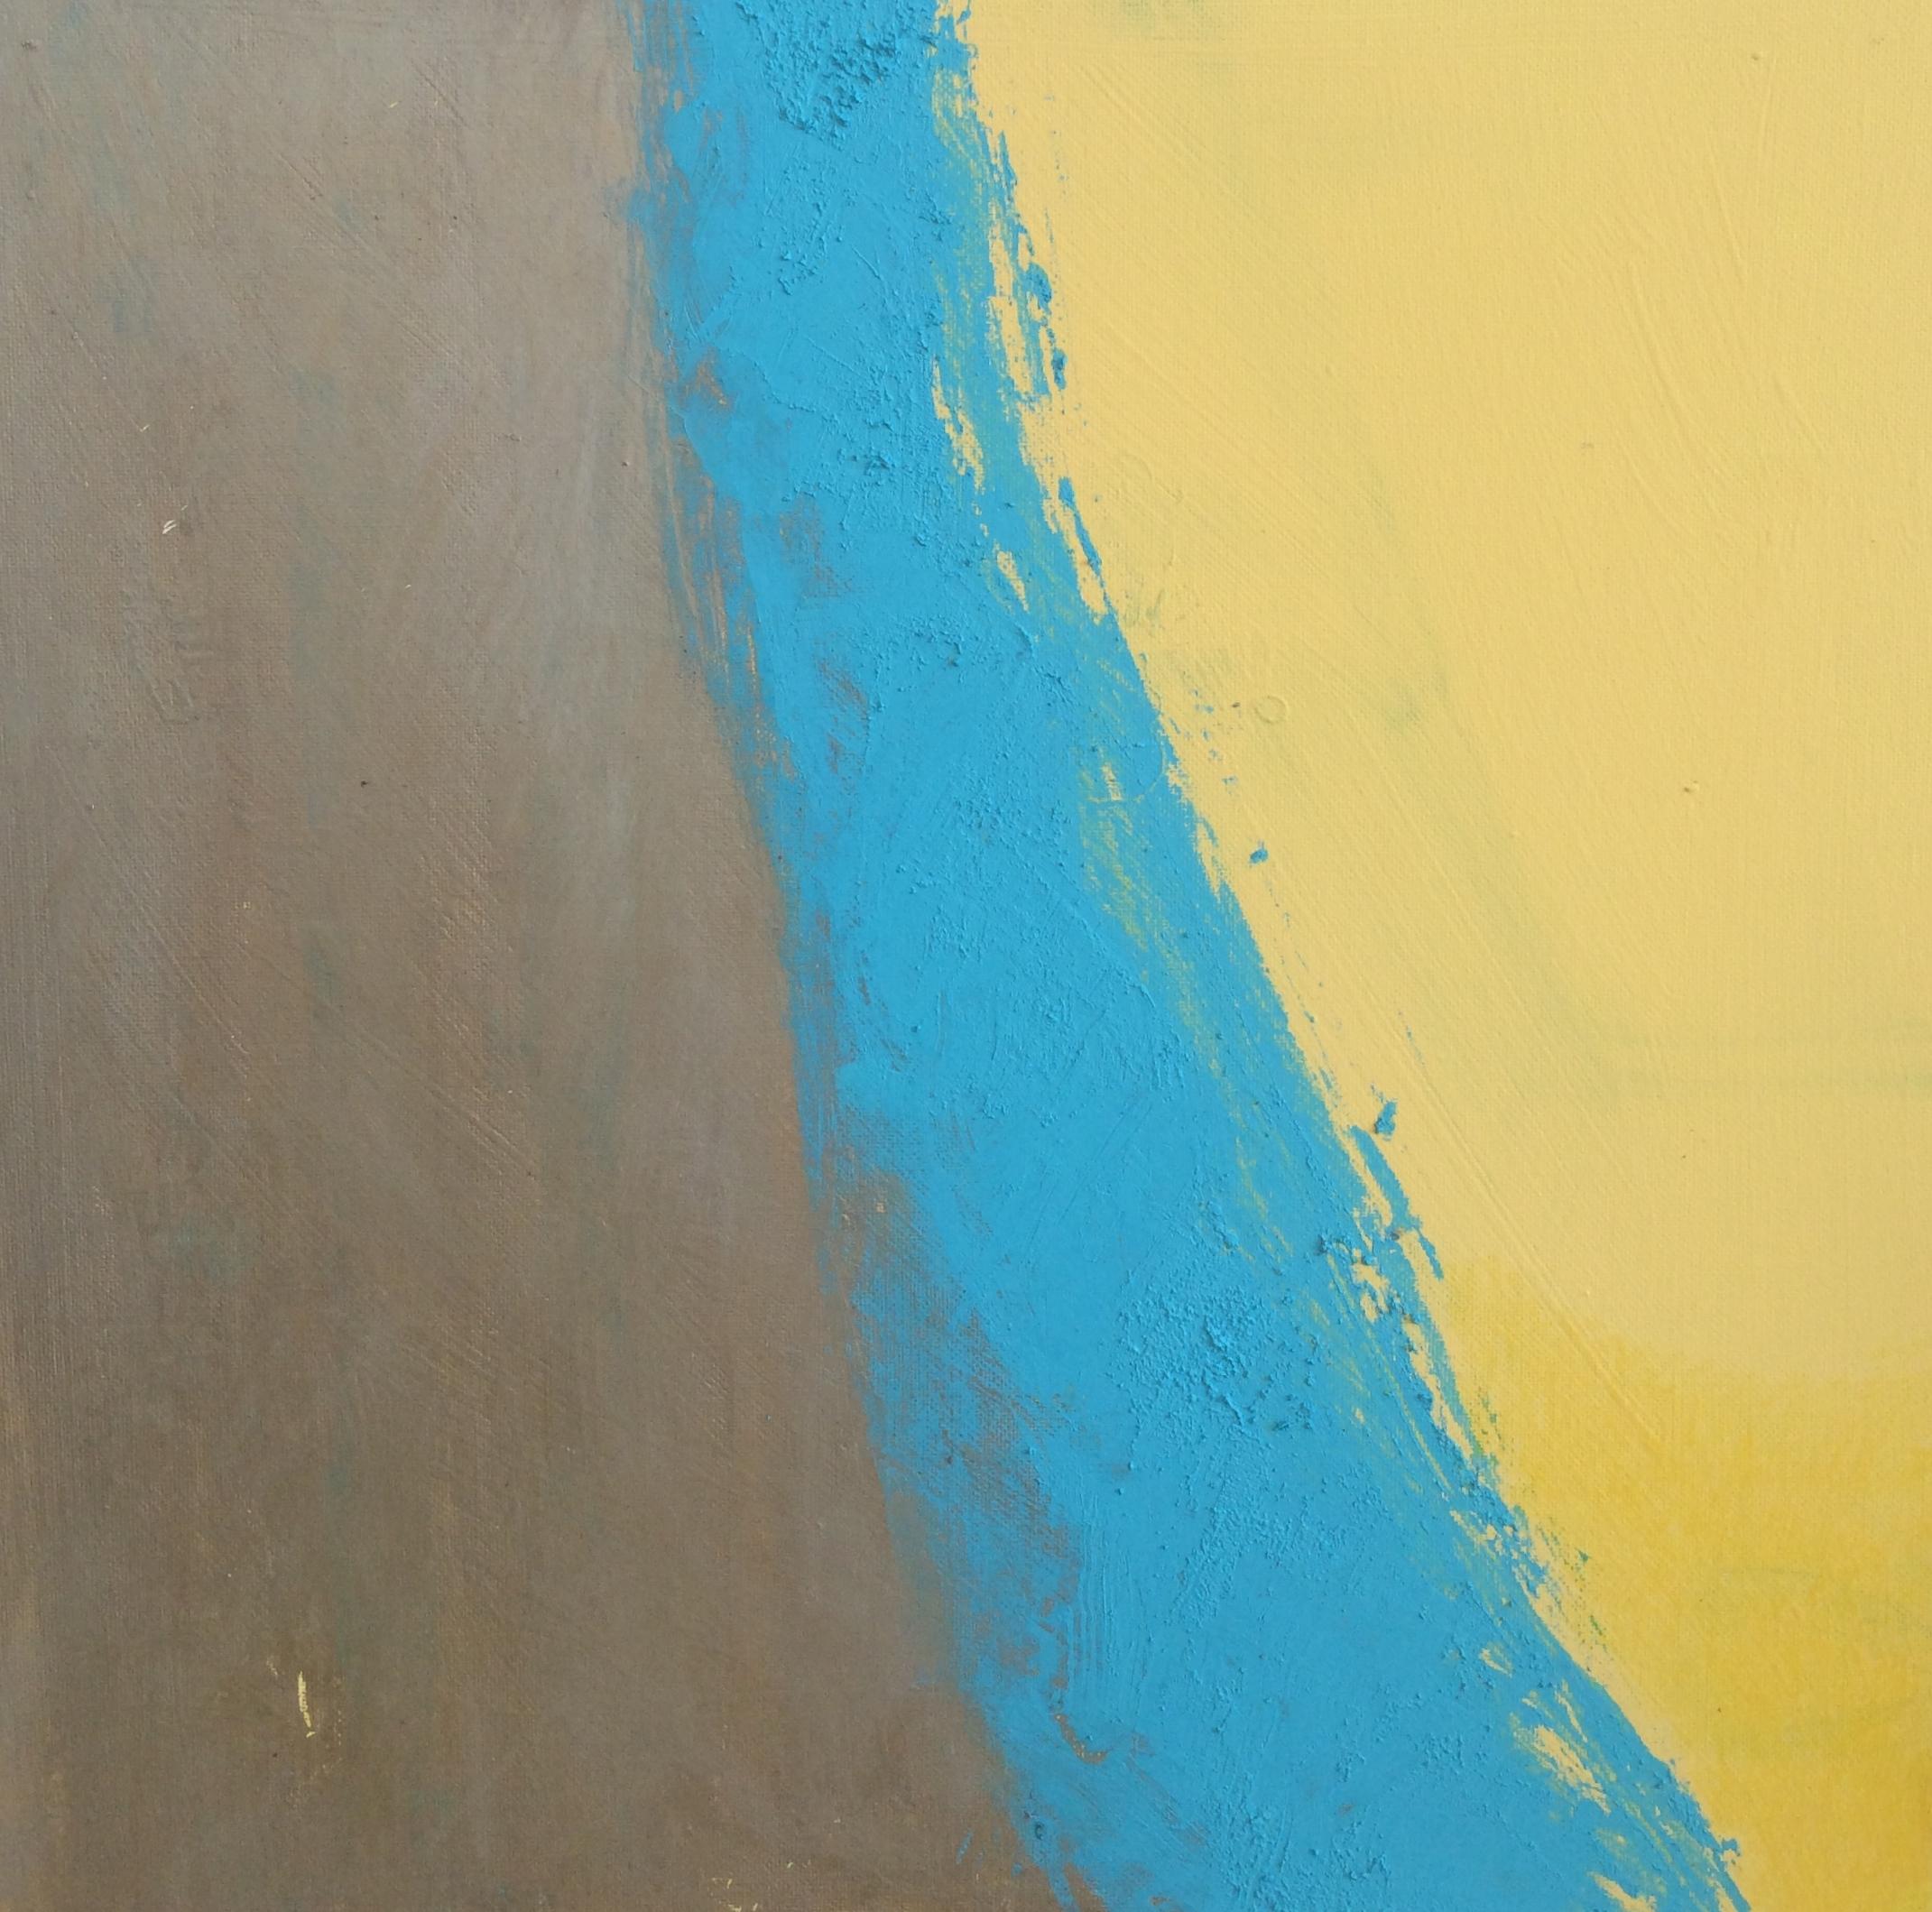 work in progress - gold, blue, yellow